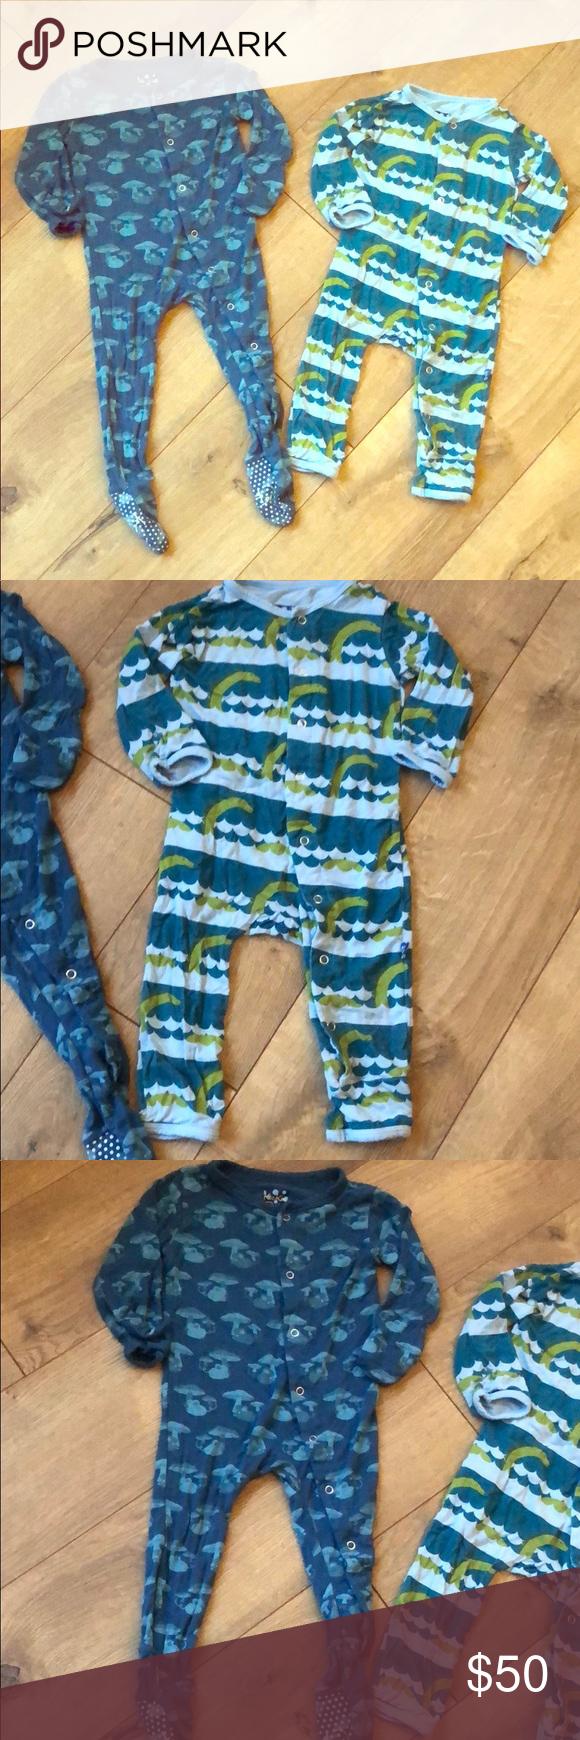 ad4a5da1fab9 KicKee Pants Sleepers Set of Super cute and soft KicKee Pants pajama ...